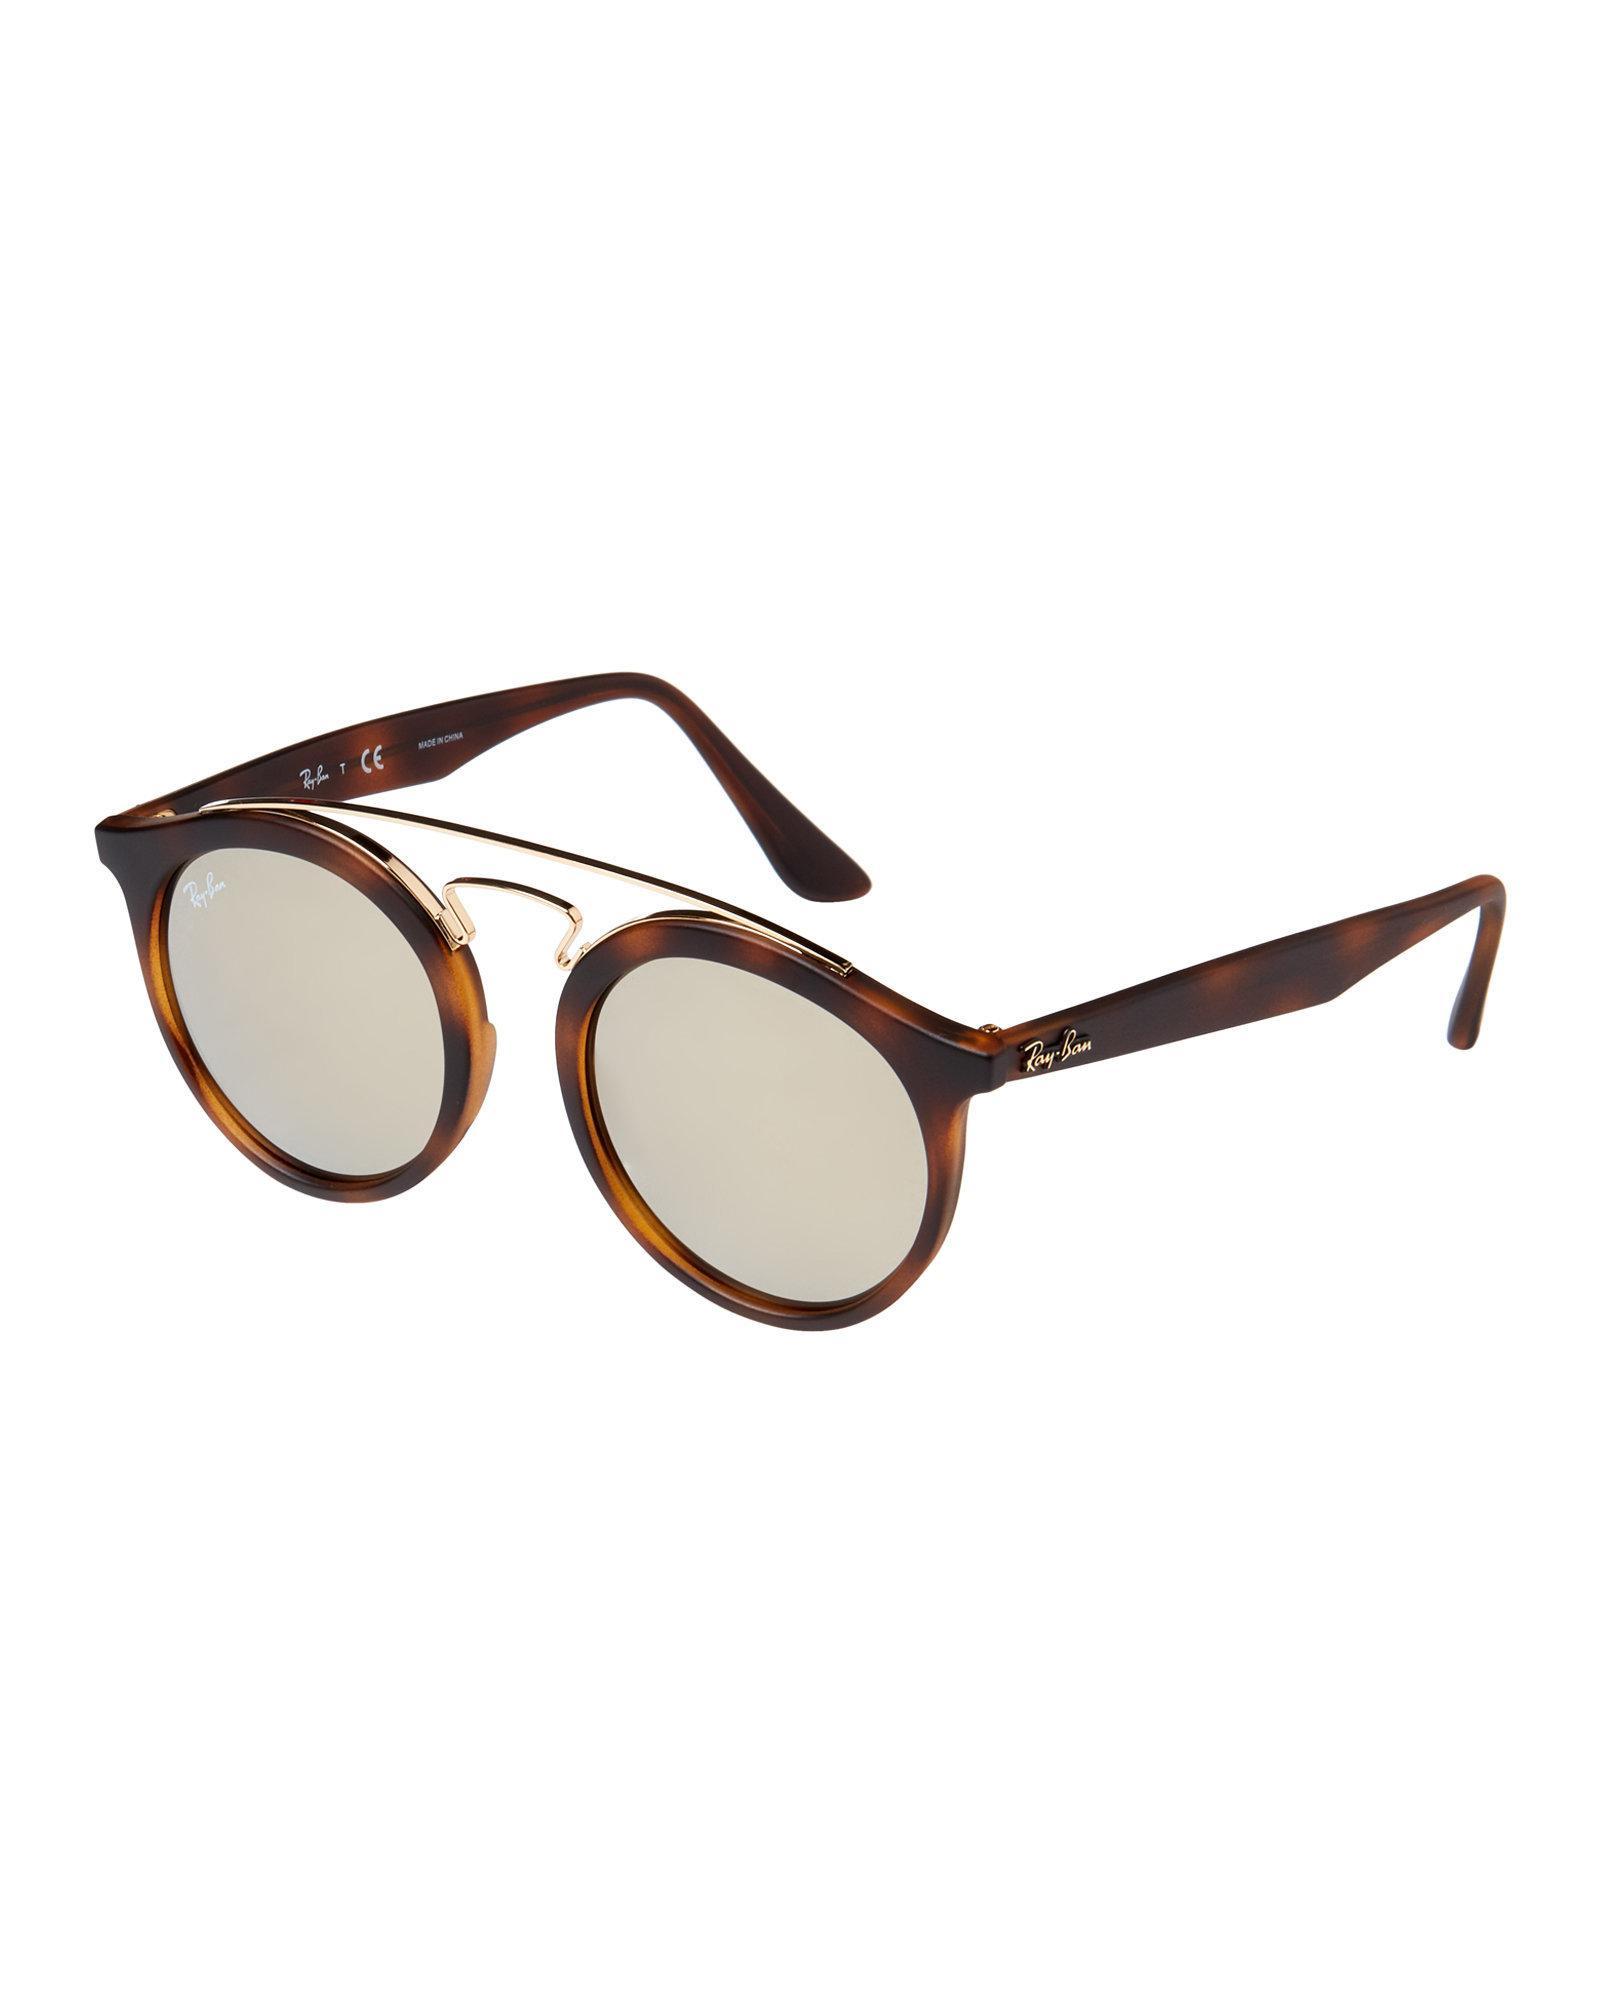 54e06b81c6 Lyst - Ray-Ban Rb4256 Tortoiseshell-look Gatsby Round Sunglasses in ...